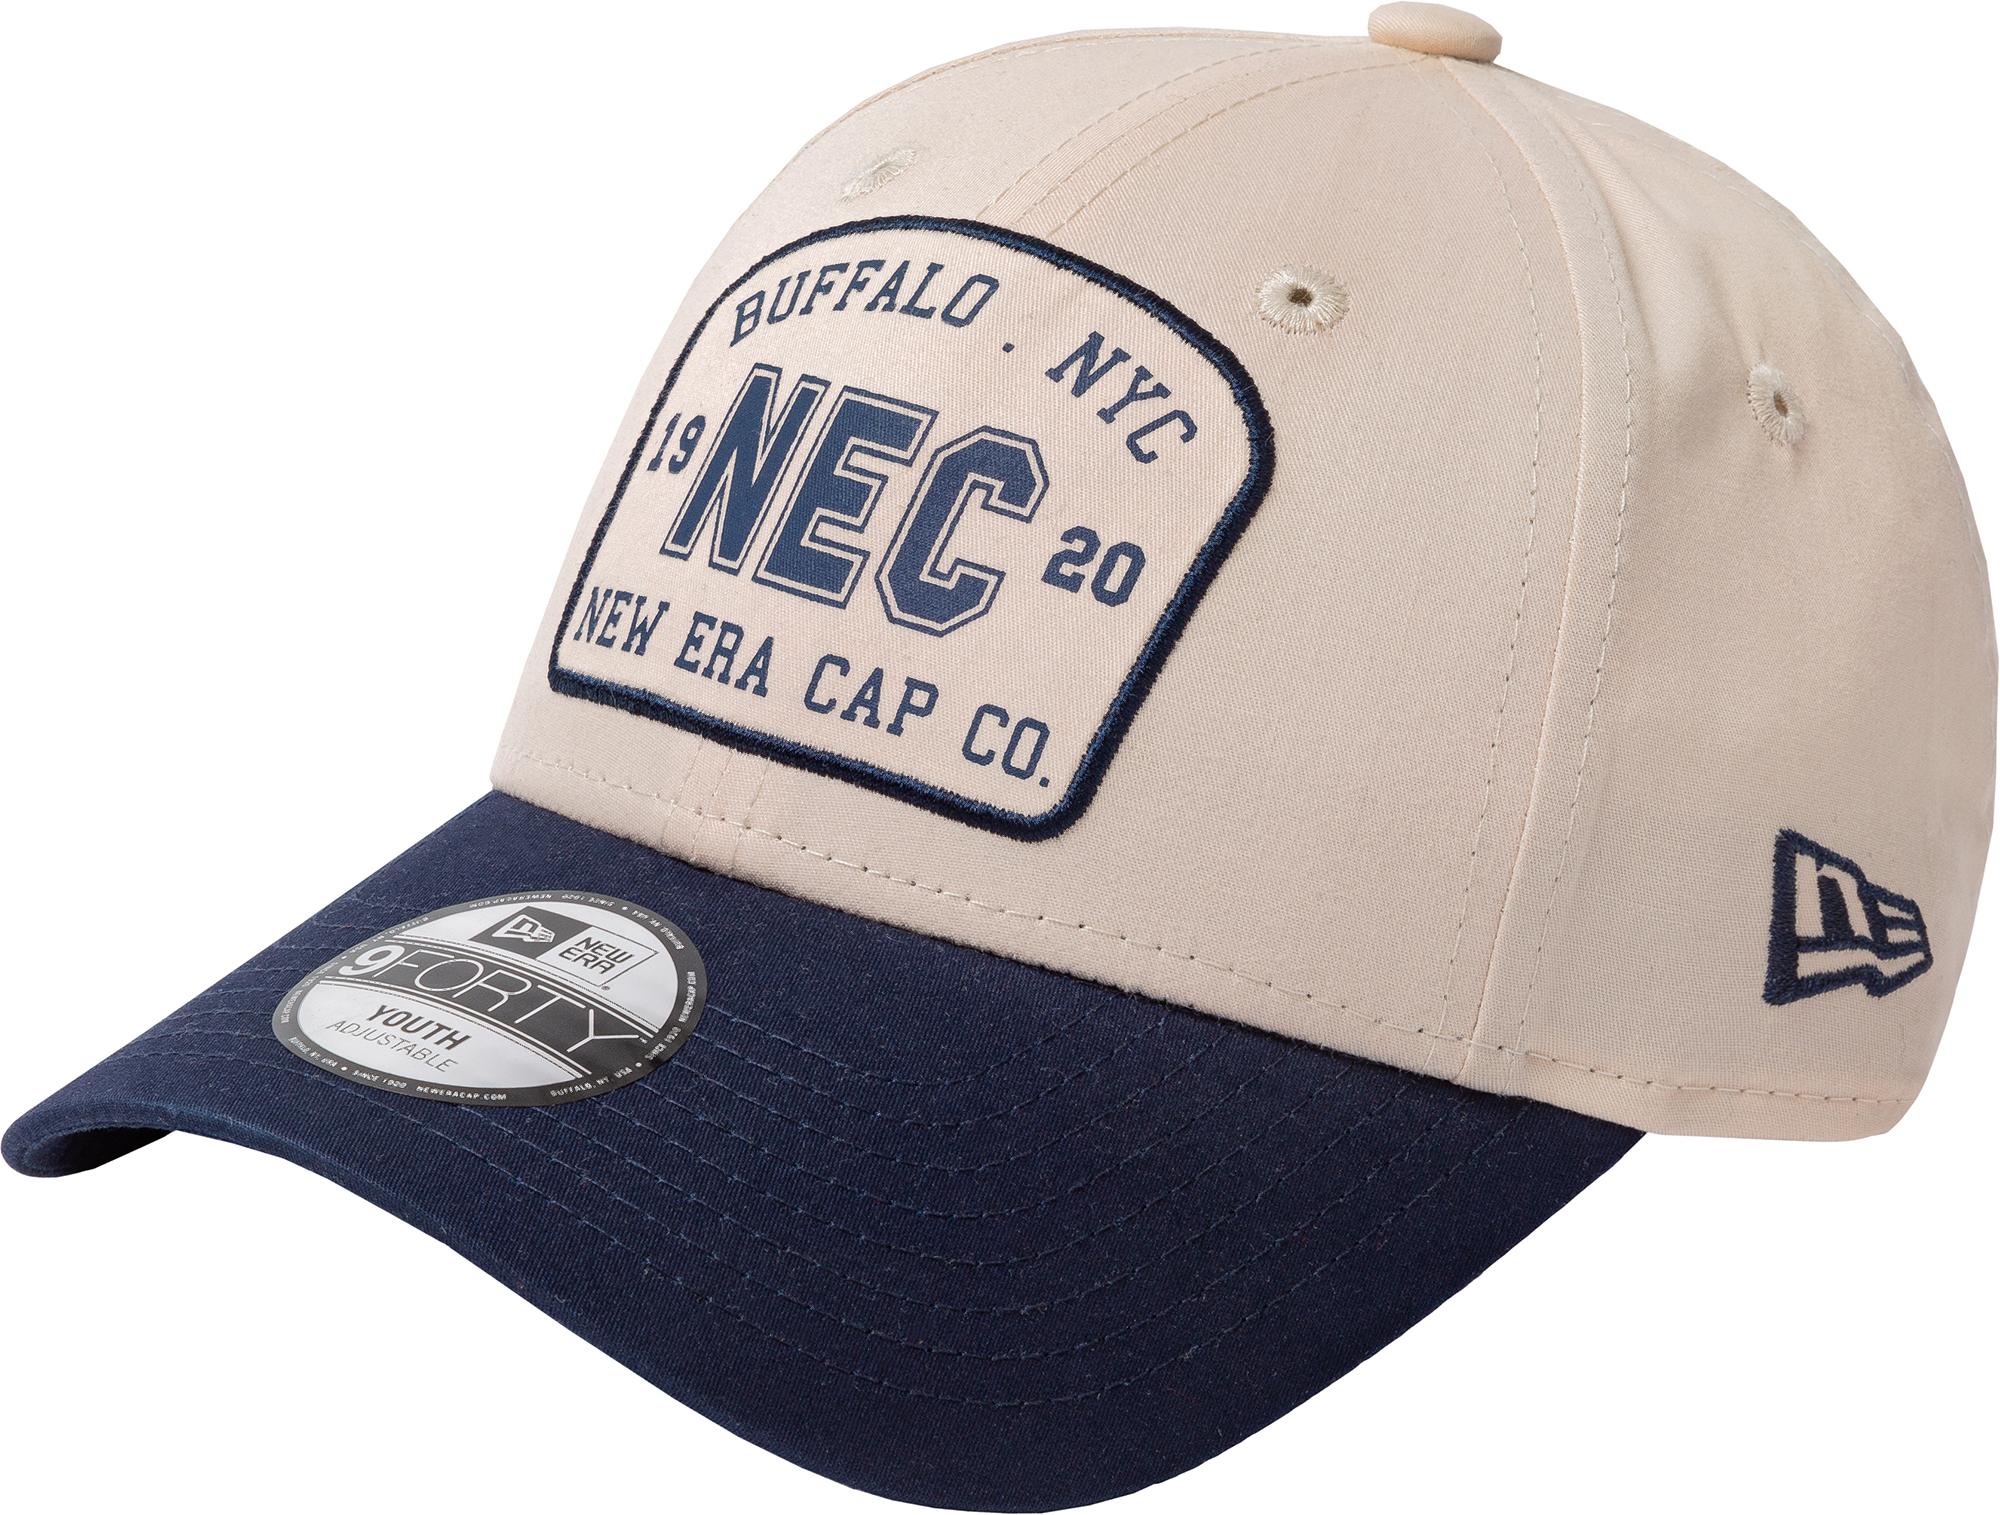 New Era Бейсболка для мальчиков New Era Arch Patch 940, размер 54-55 new era шапка для мальчиков new era ne cuff pom размер 54 55